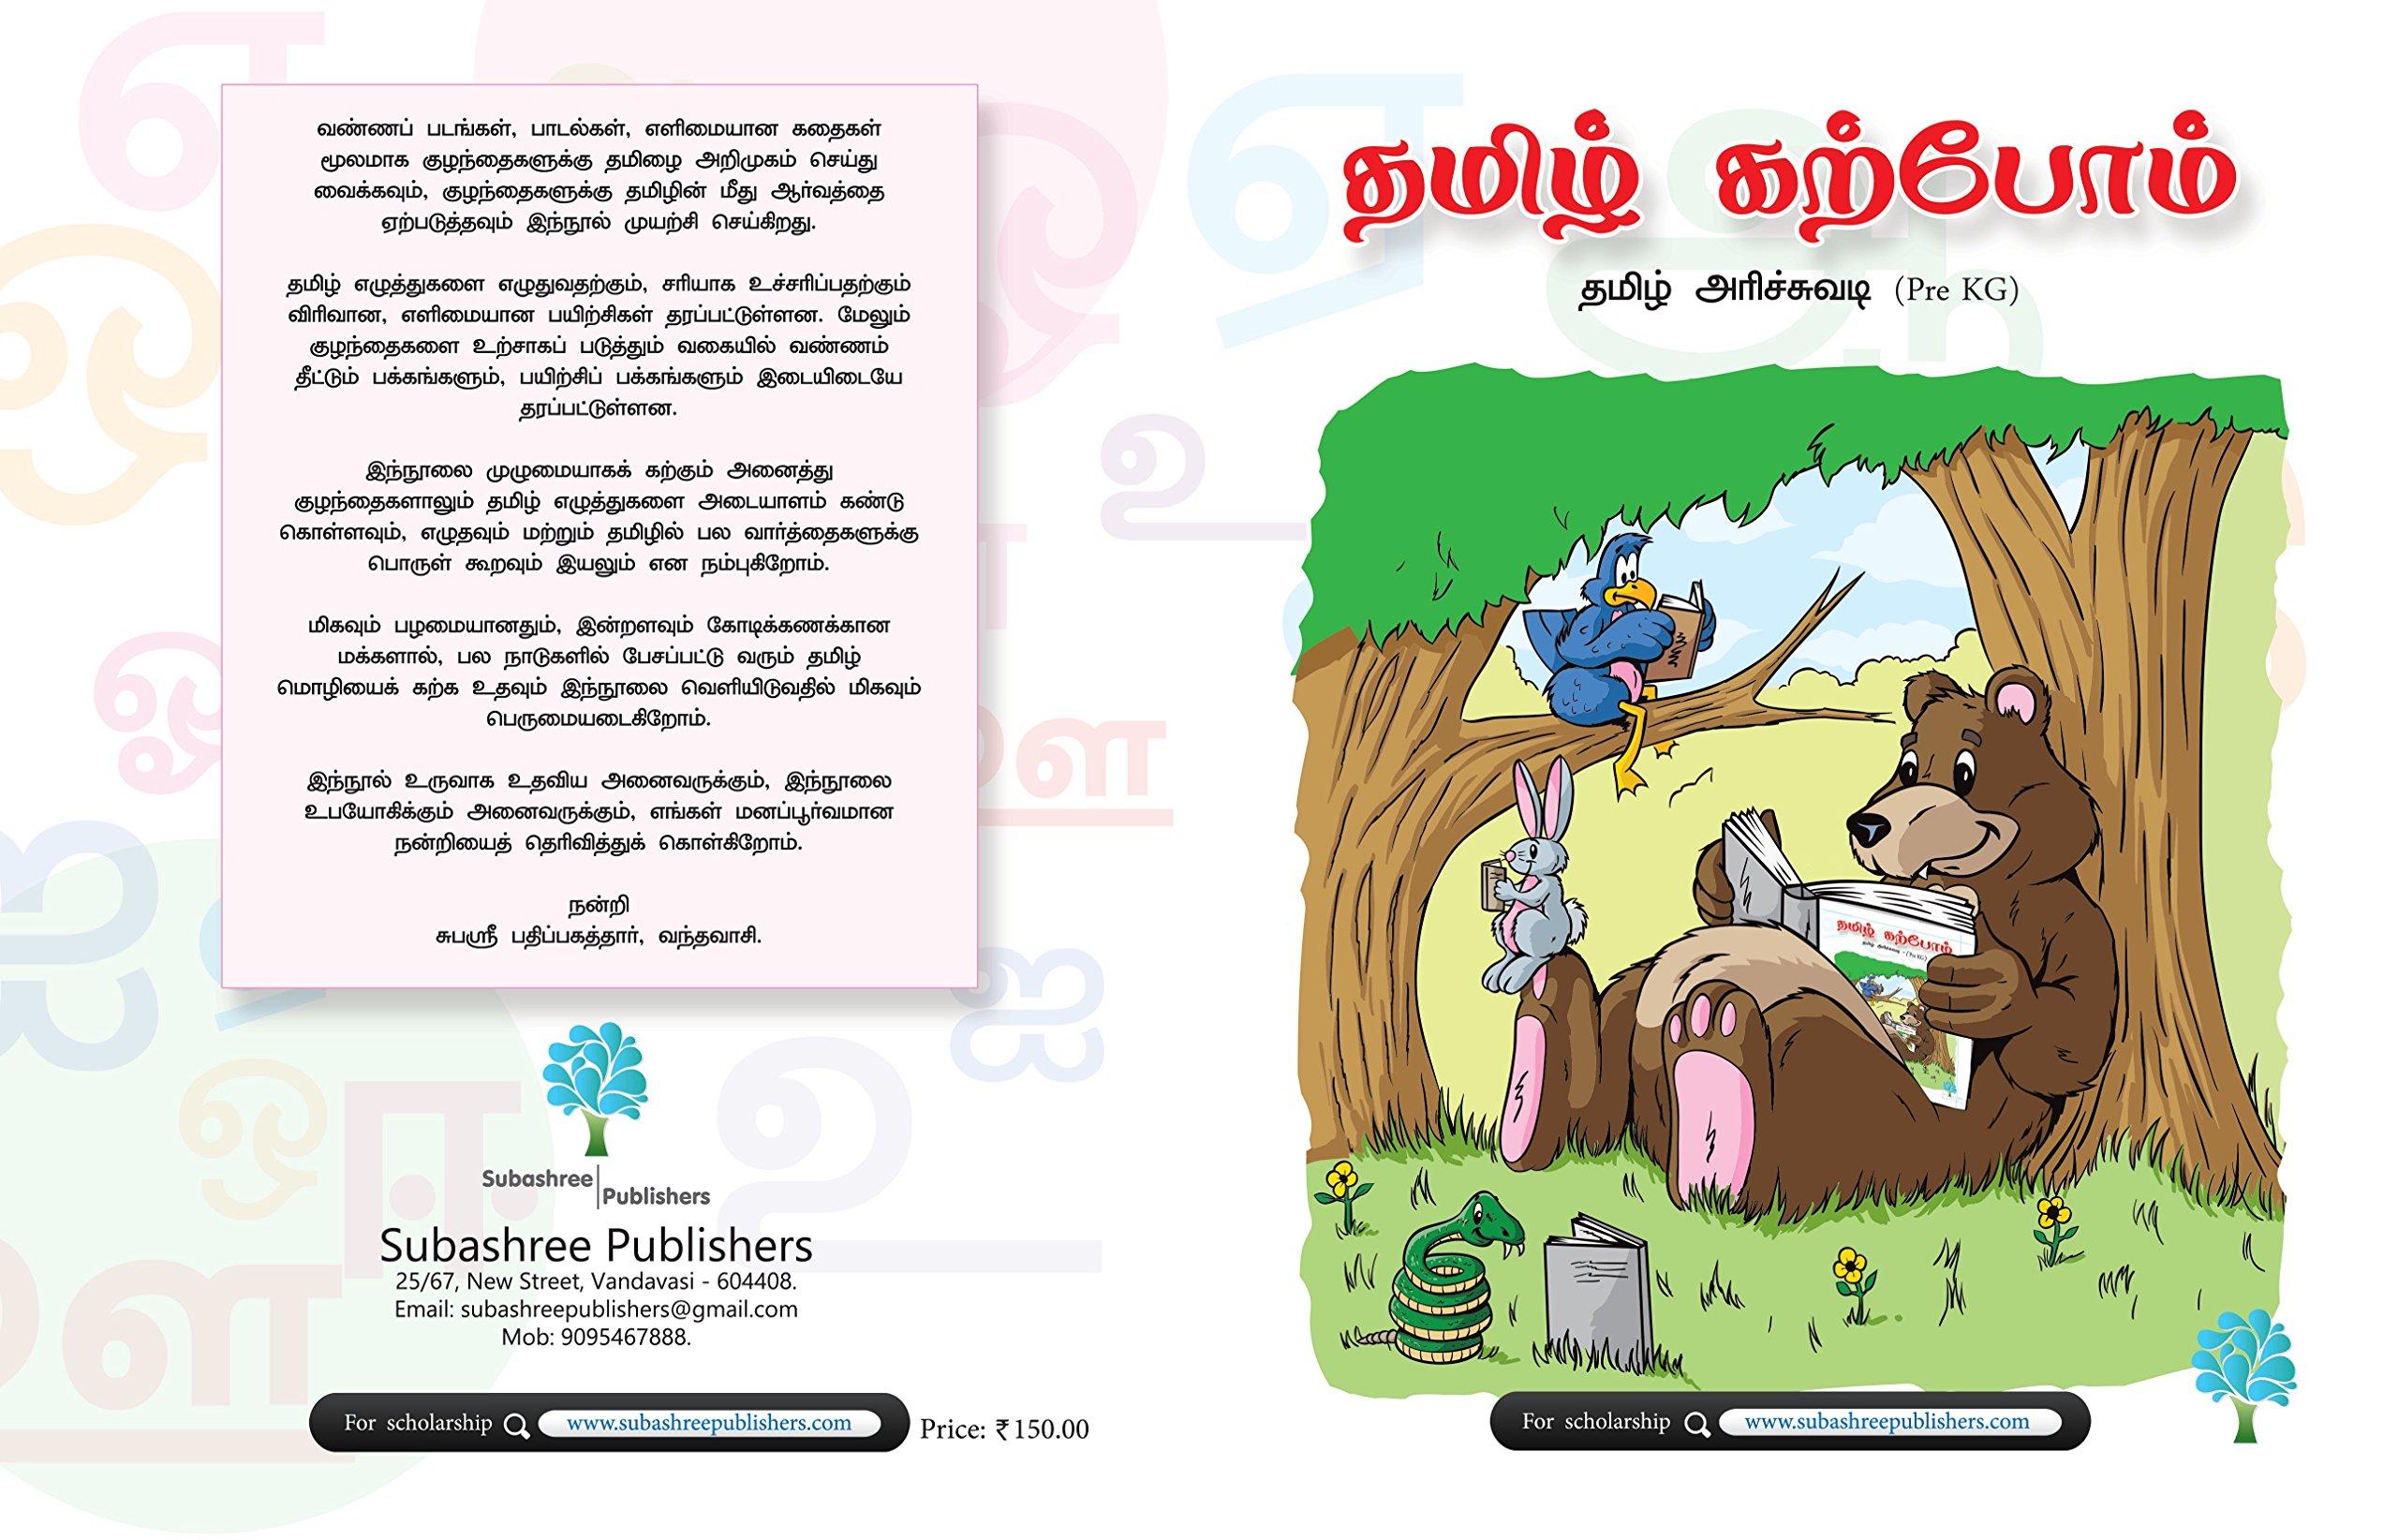 Buy Subashree Tamil Text Book PREKG & Tamil Rhymes Part 1